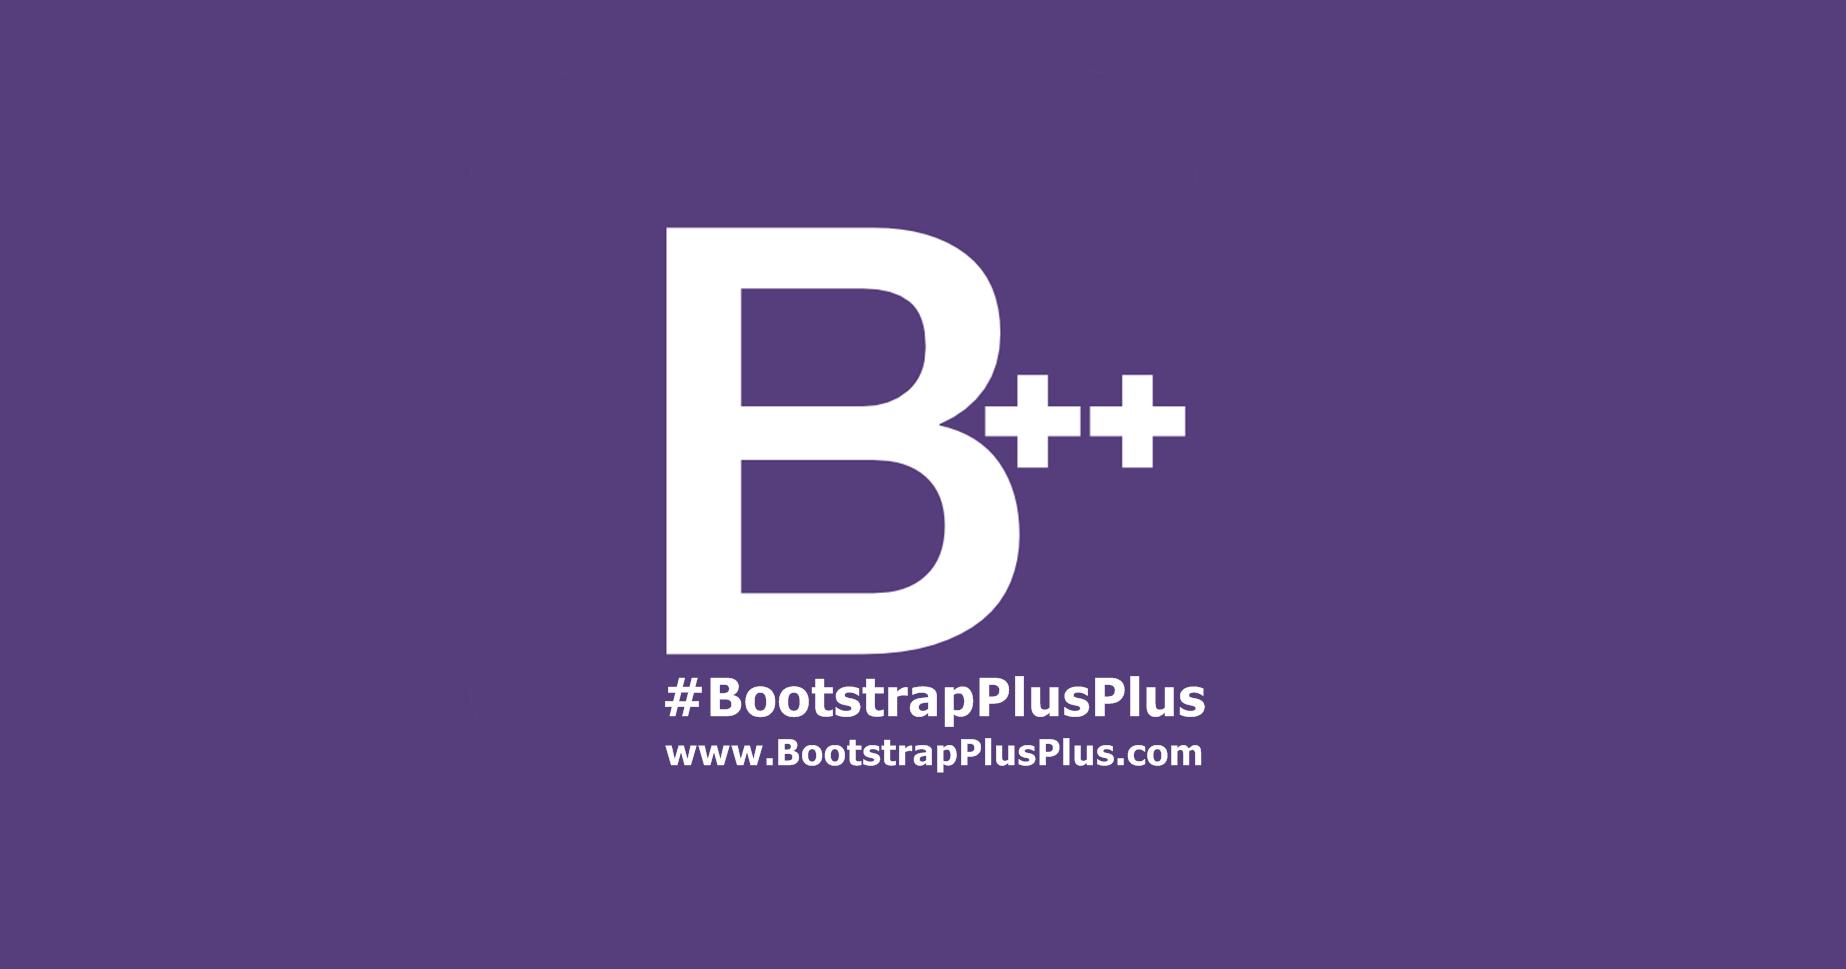 BootstrapPlusPlus